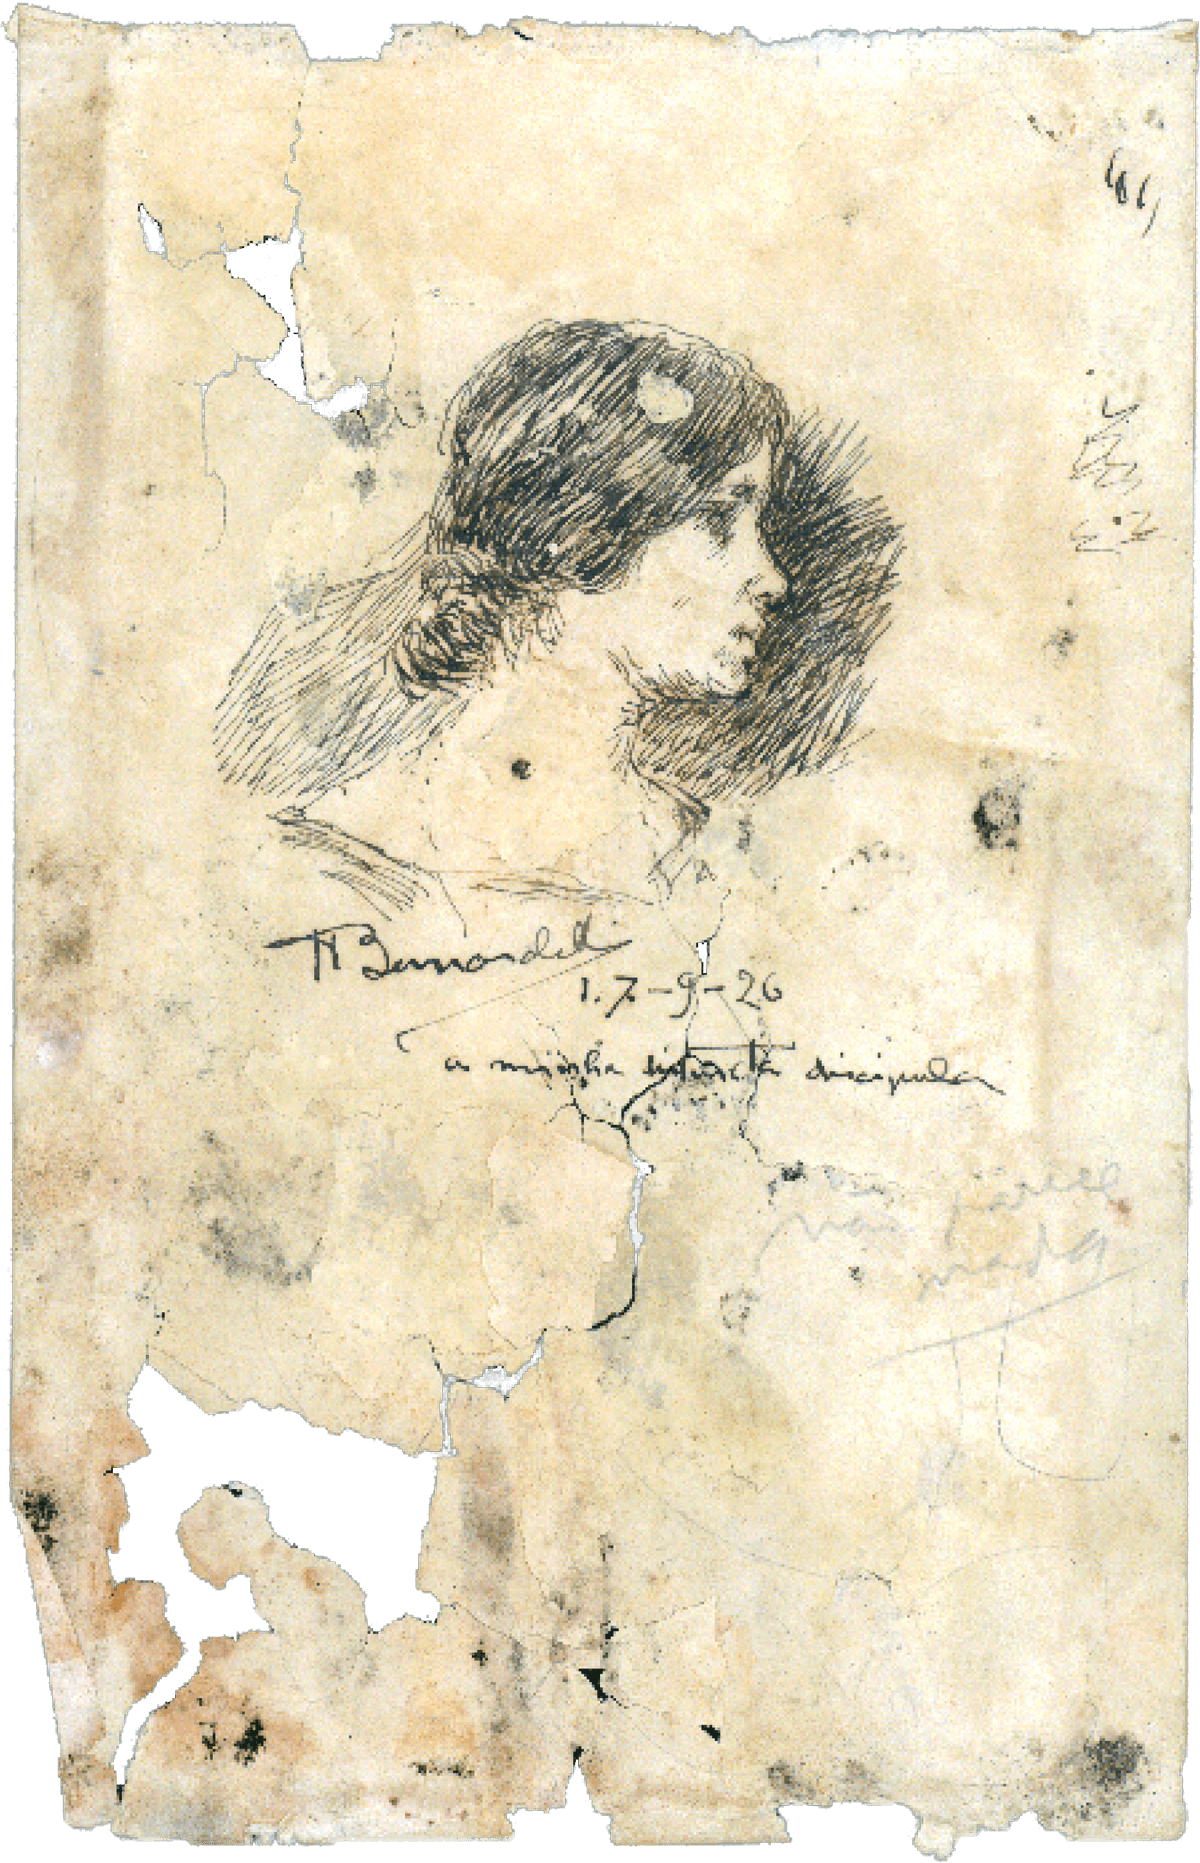 Leleta desenhada pelo pintor Henrique Bernardelli